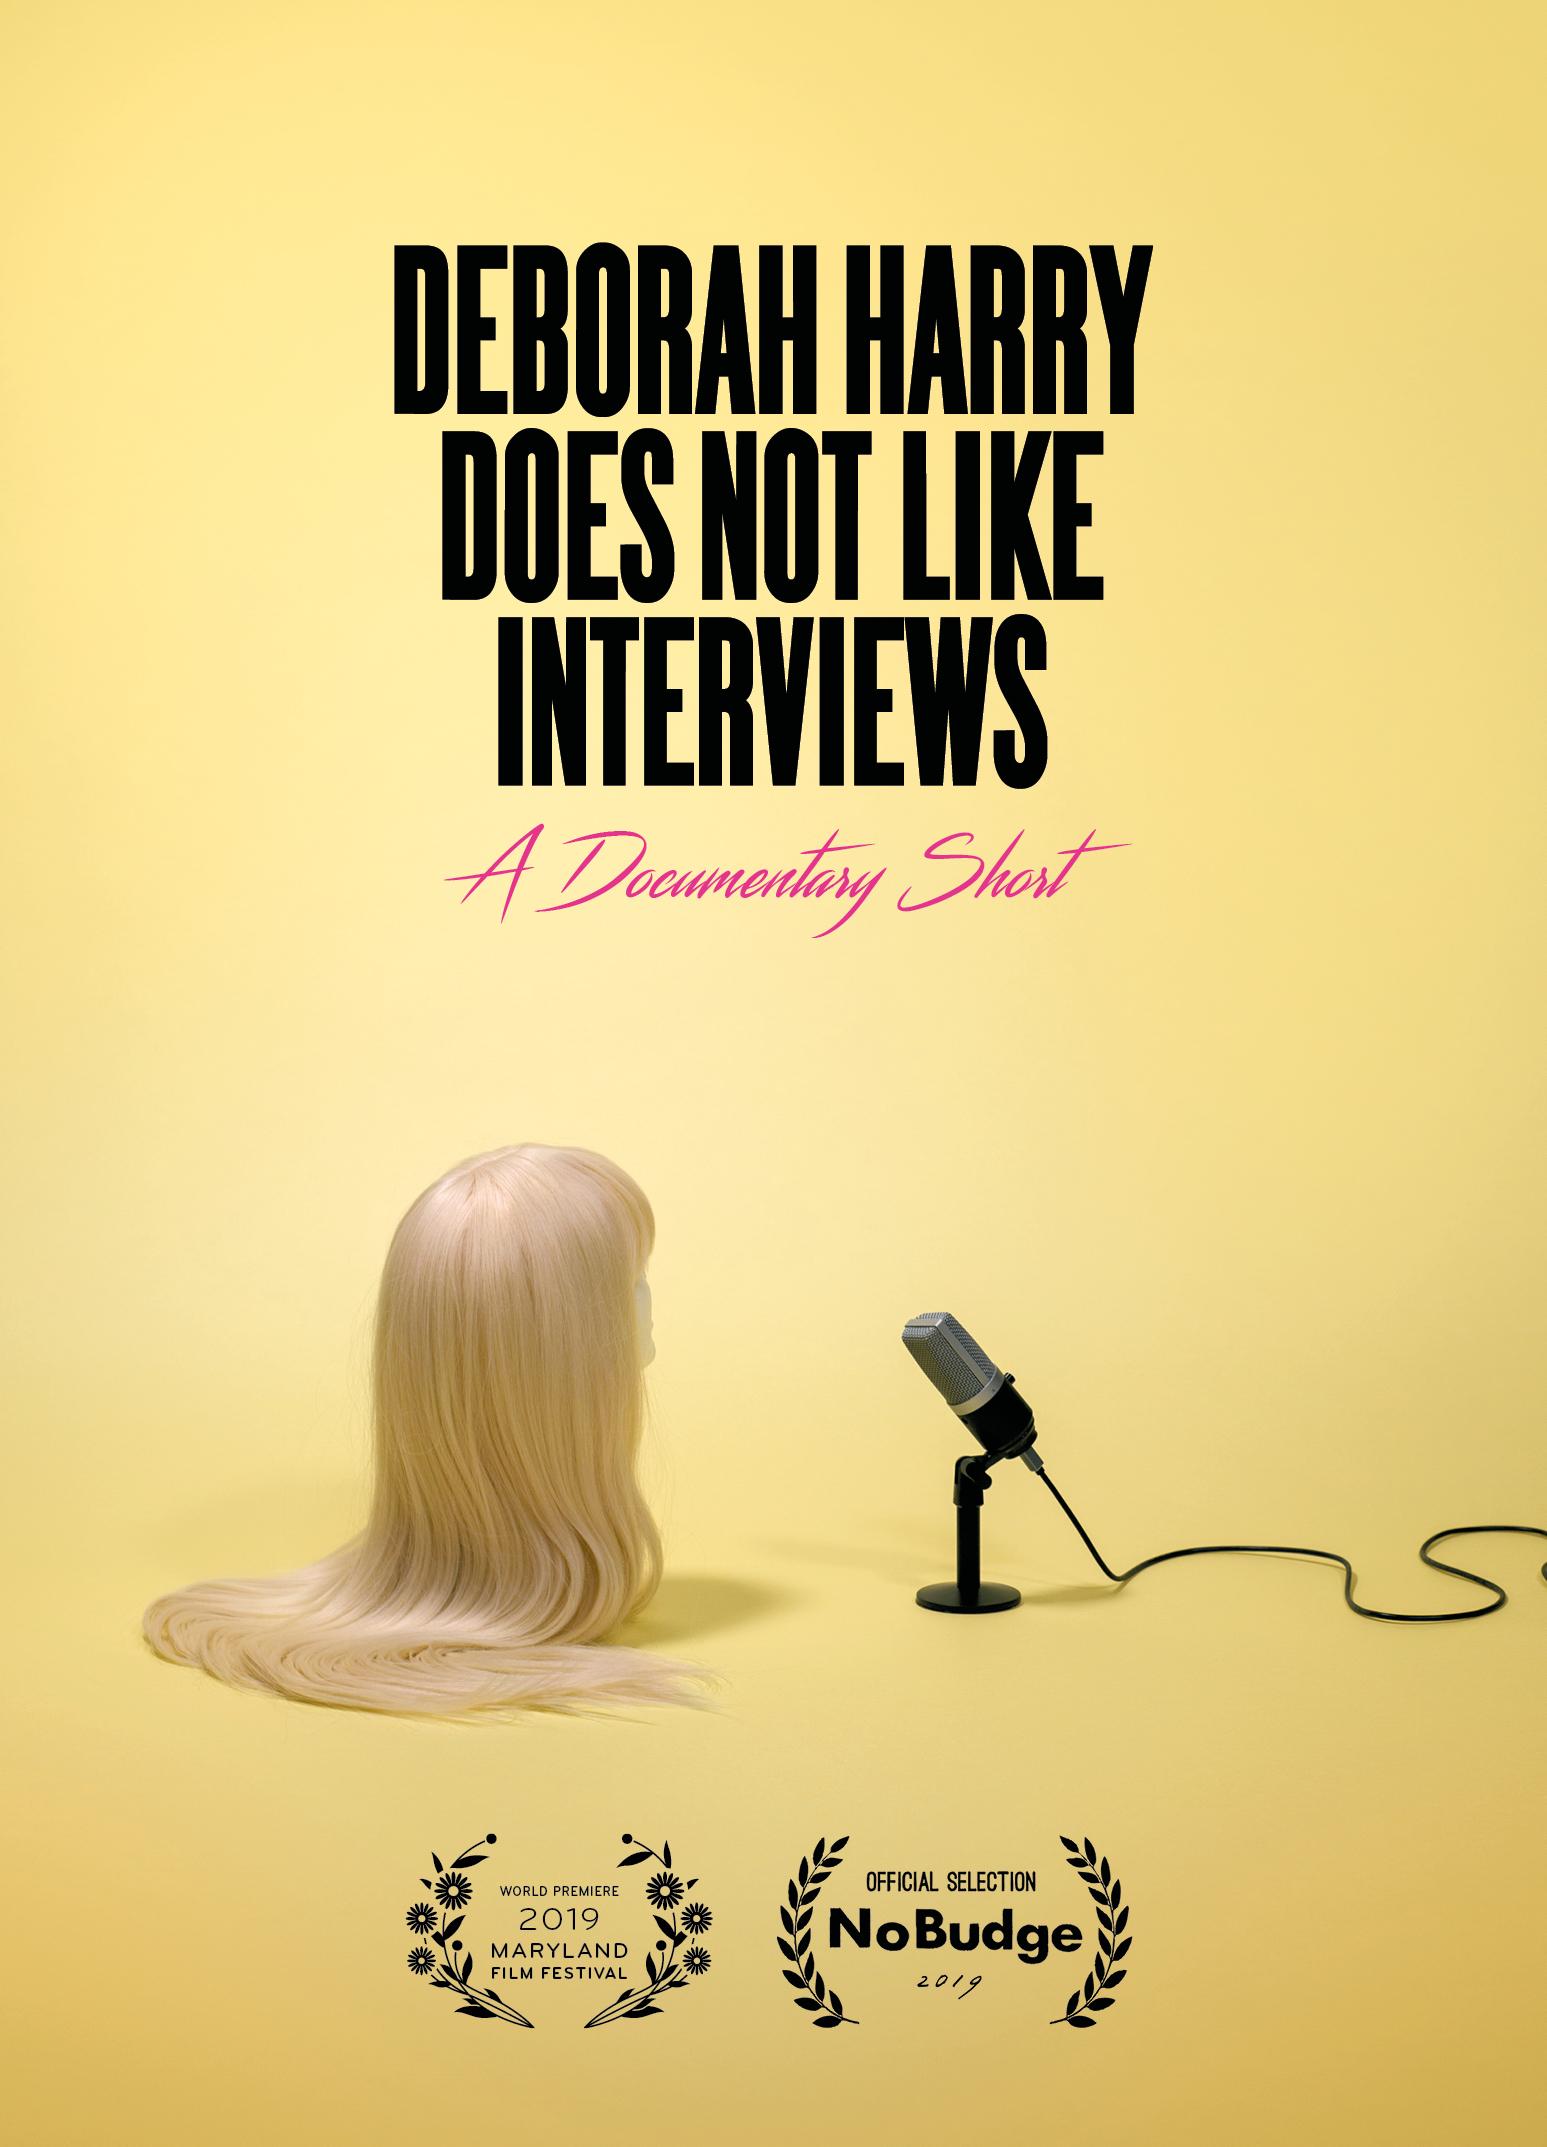 Deborah Harry Does Not Like Interviews poster